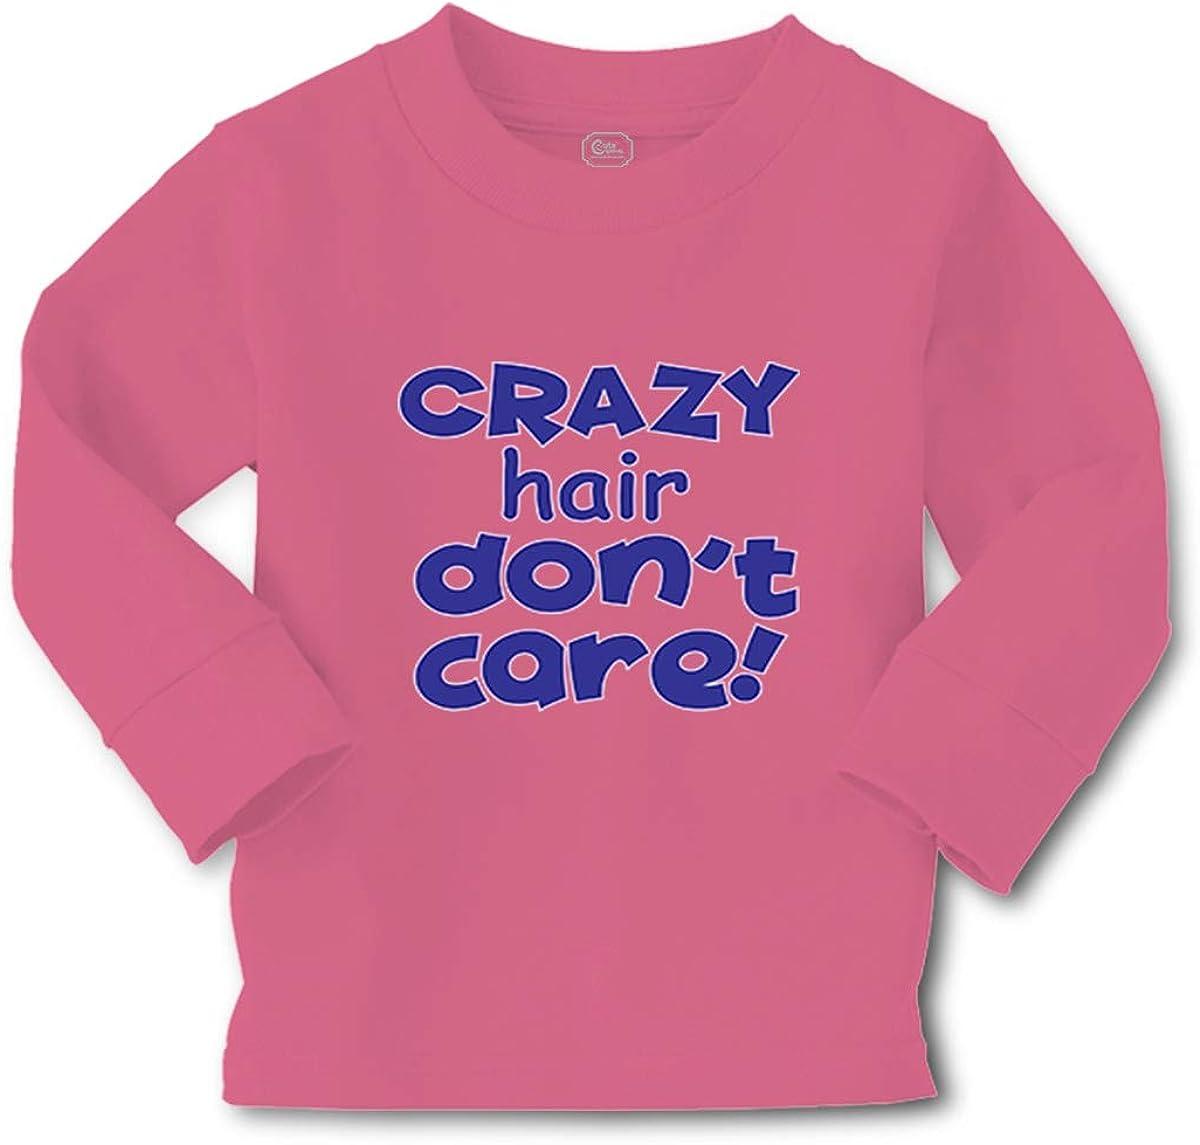 Cute Rascals Crazy Hair Don't Care Long Sleeve Crewneck Boys-Girls Cotton T-Shirt Tee